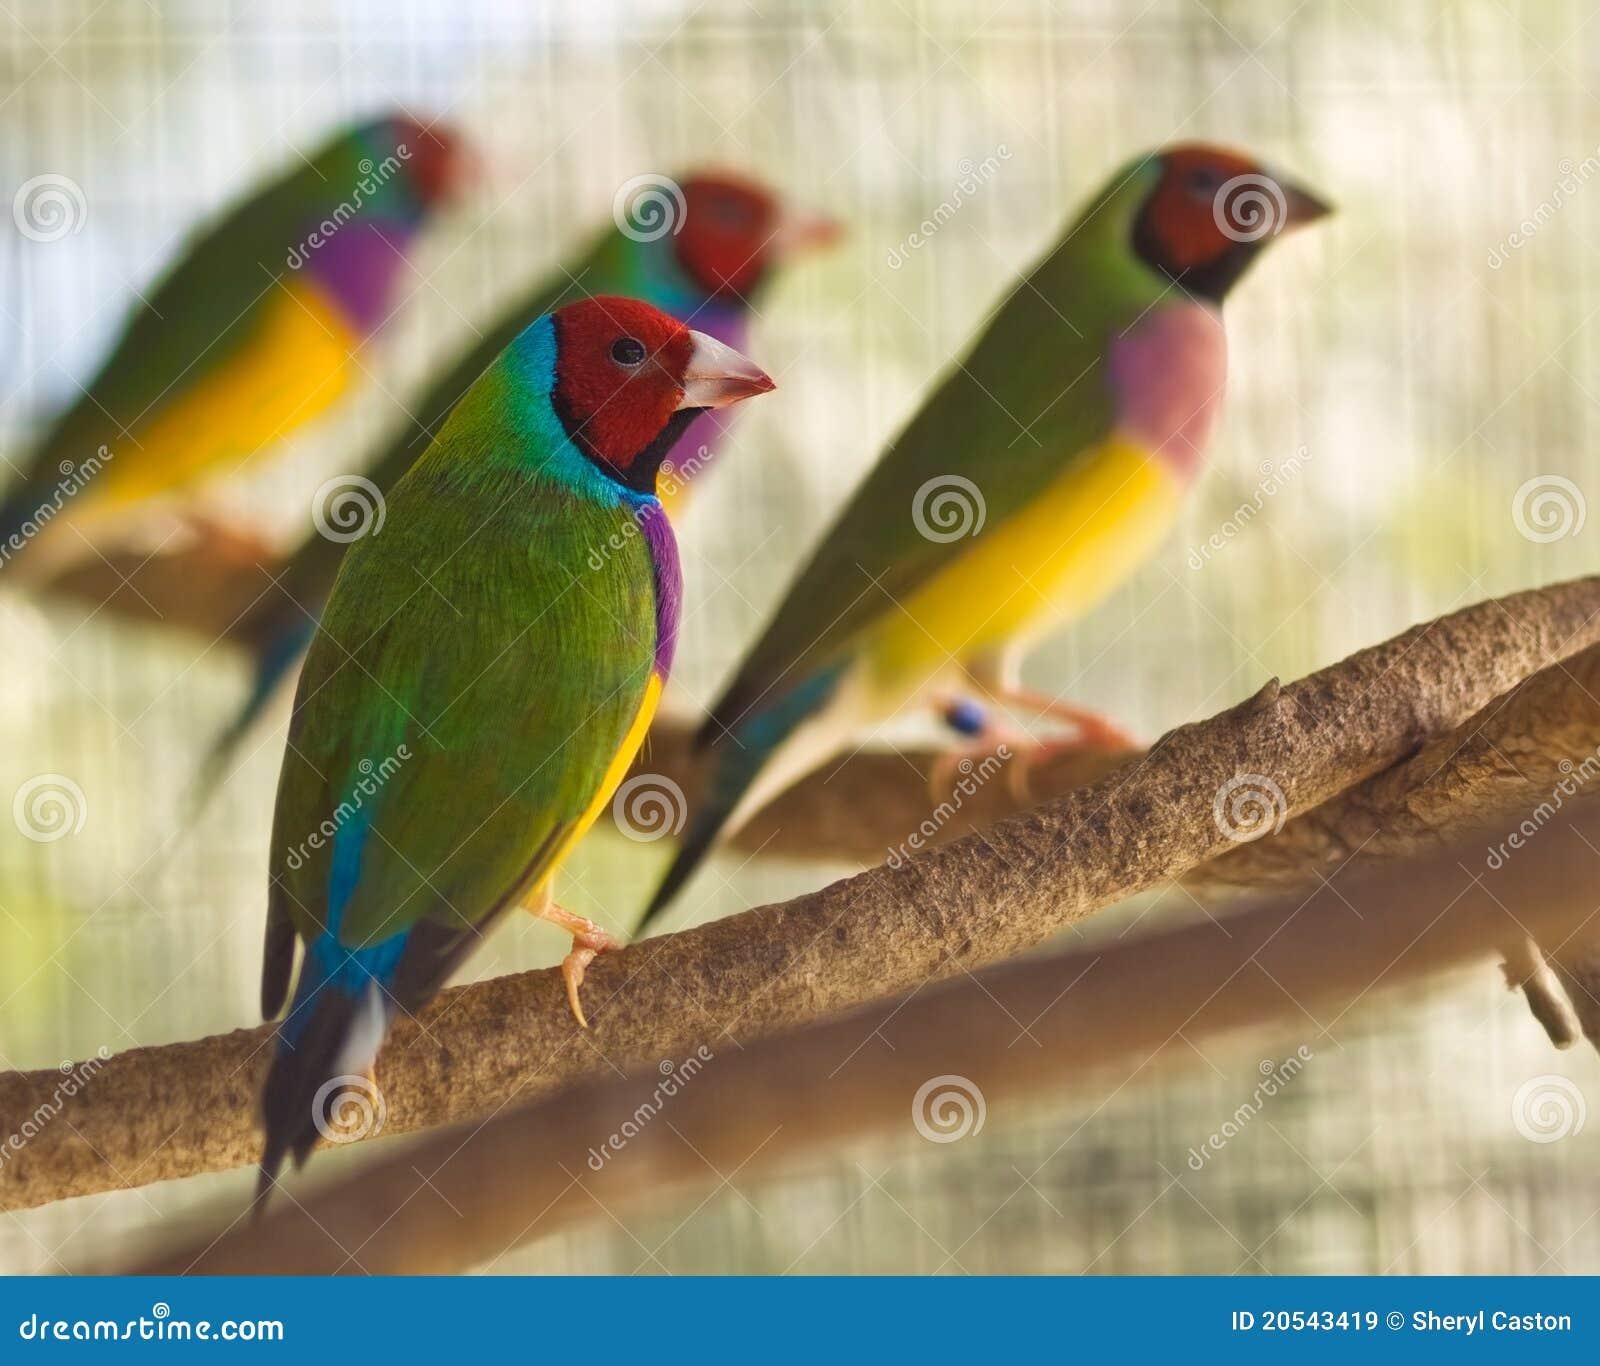 Australian gouldian finch native birds